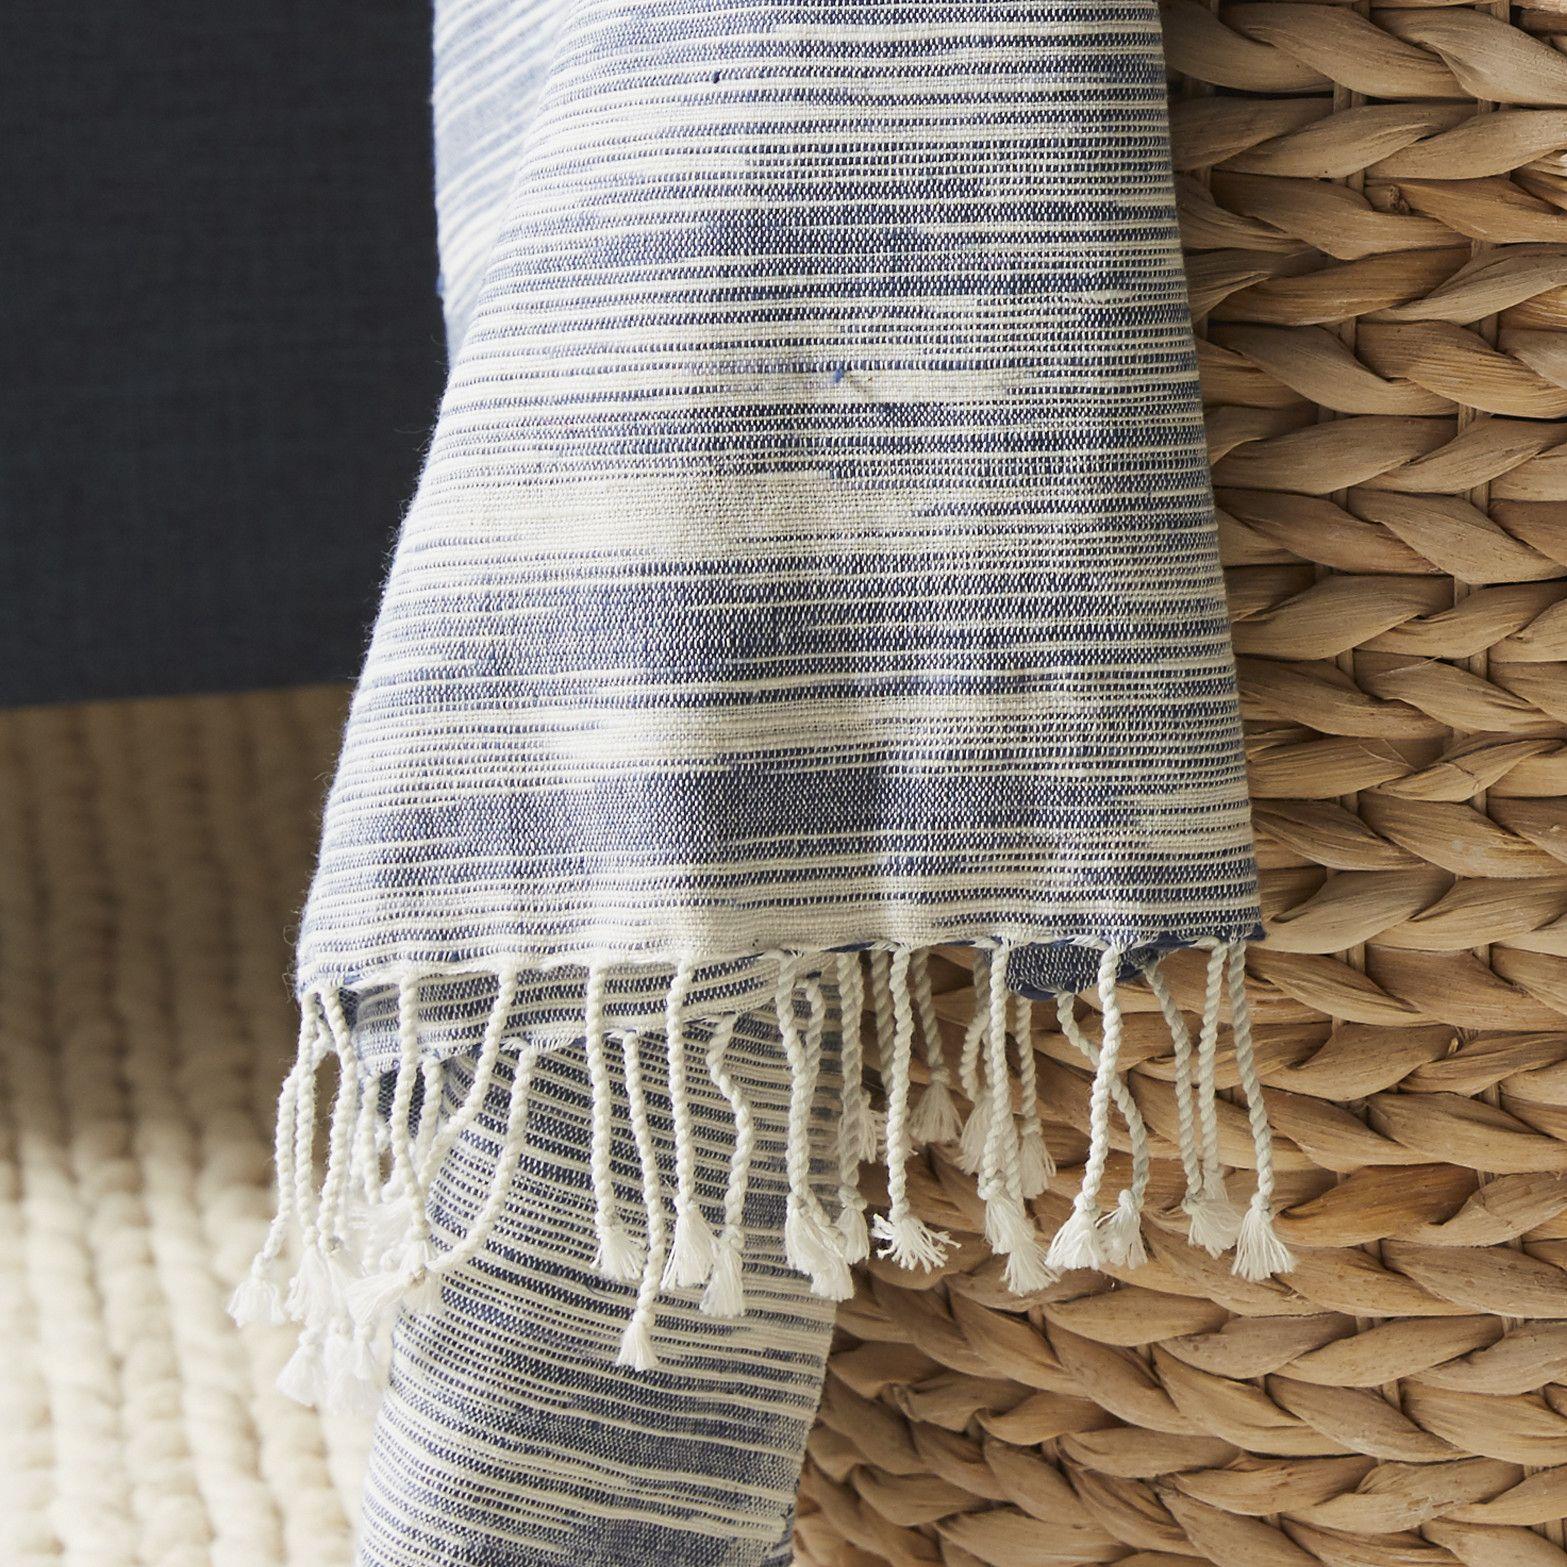 gattilier essential handloom modern throw blanket  throw blankets  - gattilier essential handloom modern throw blanket